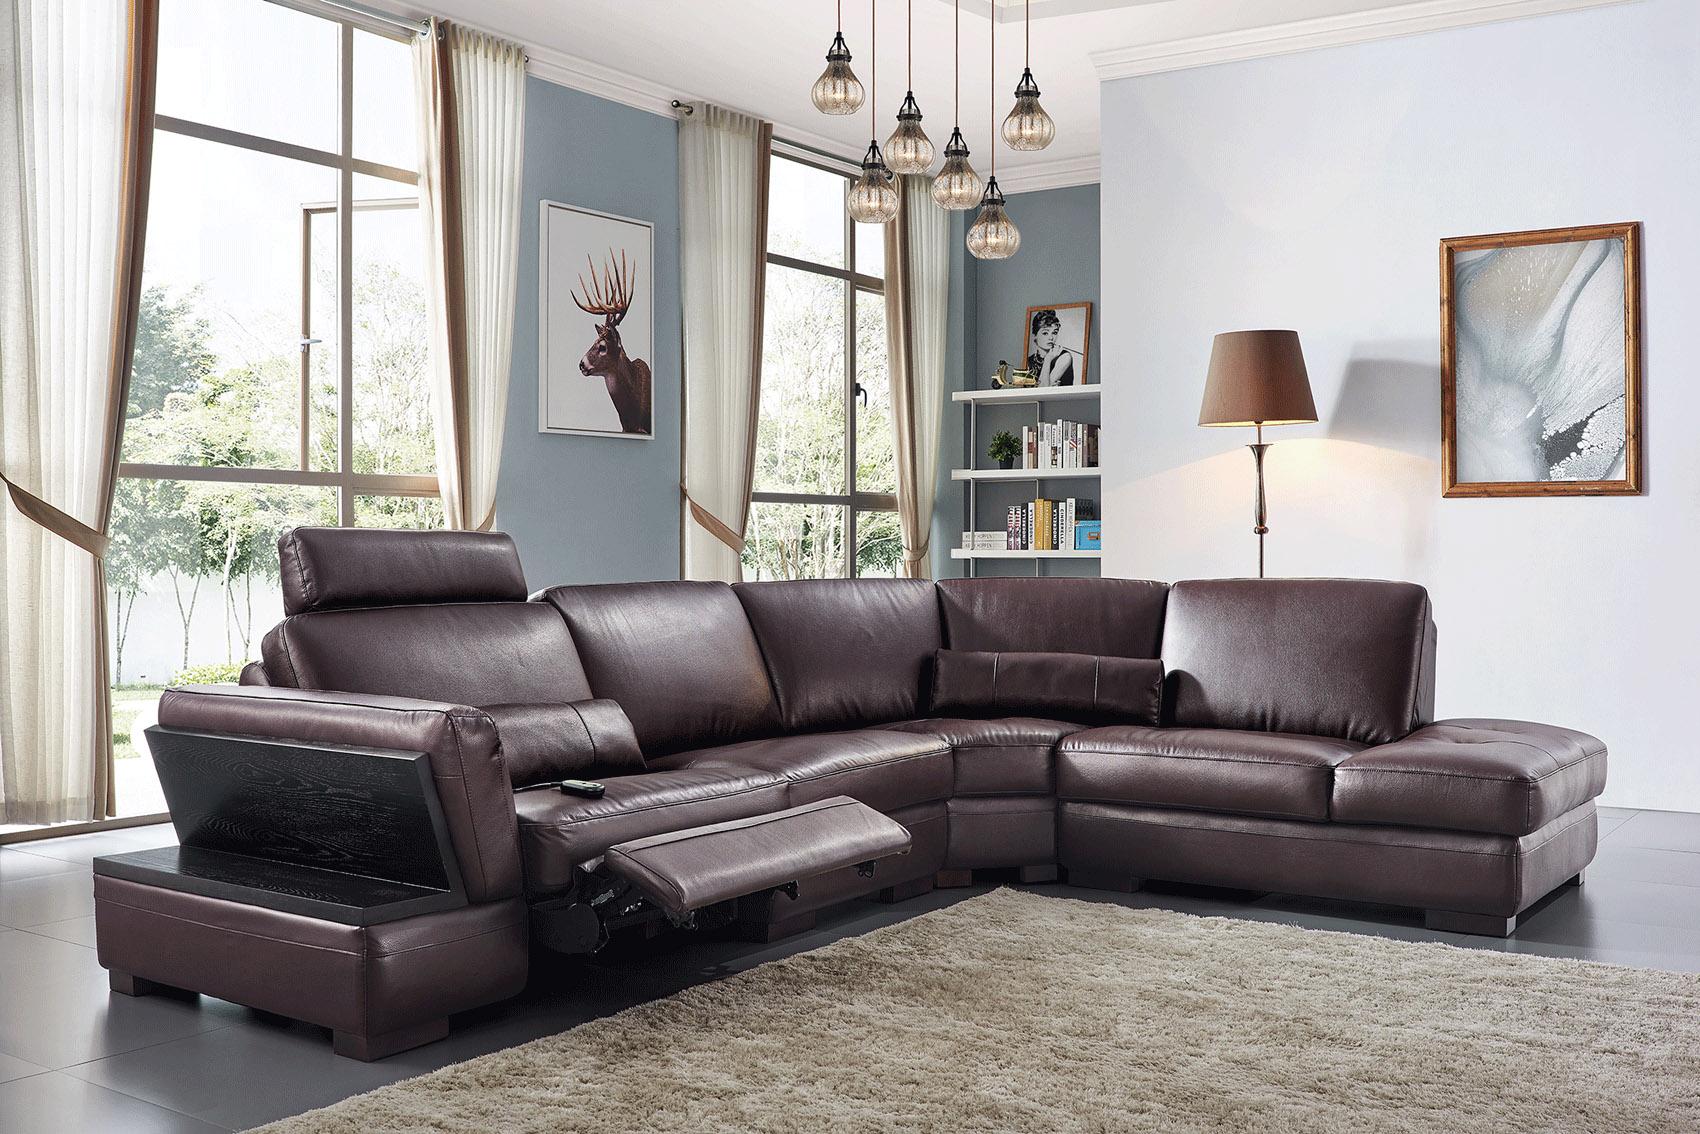 leather corner sofa spain custom design little green notebook exquisite upholstery l shape winston